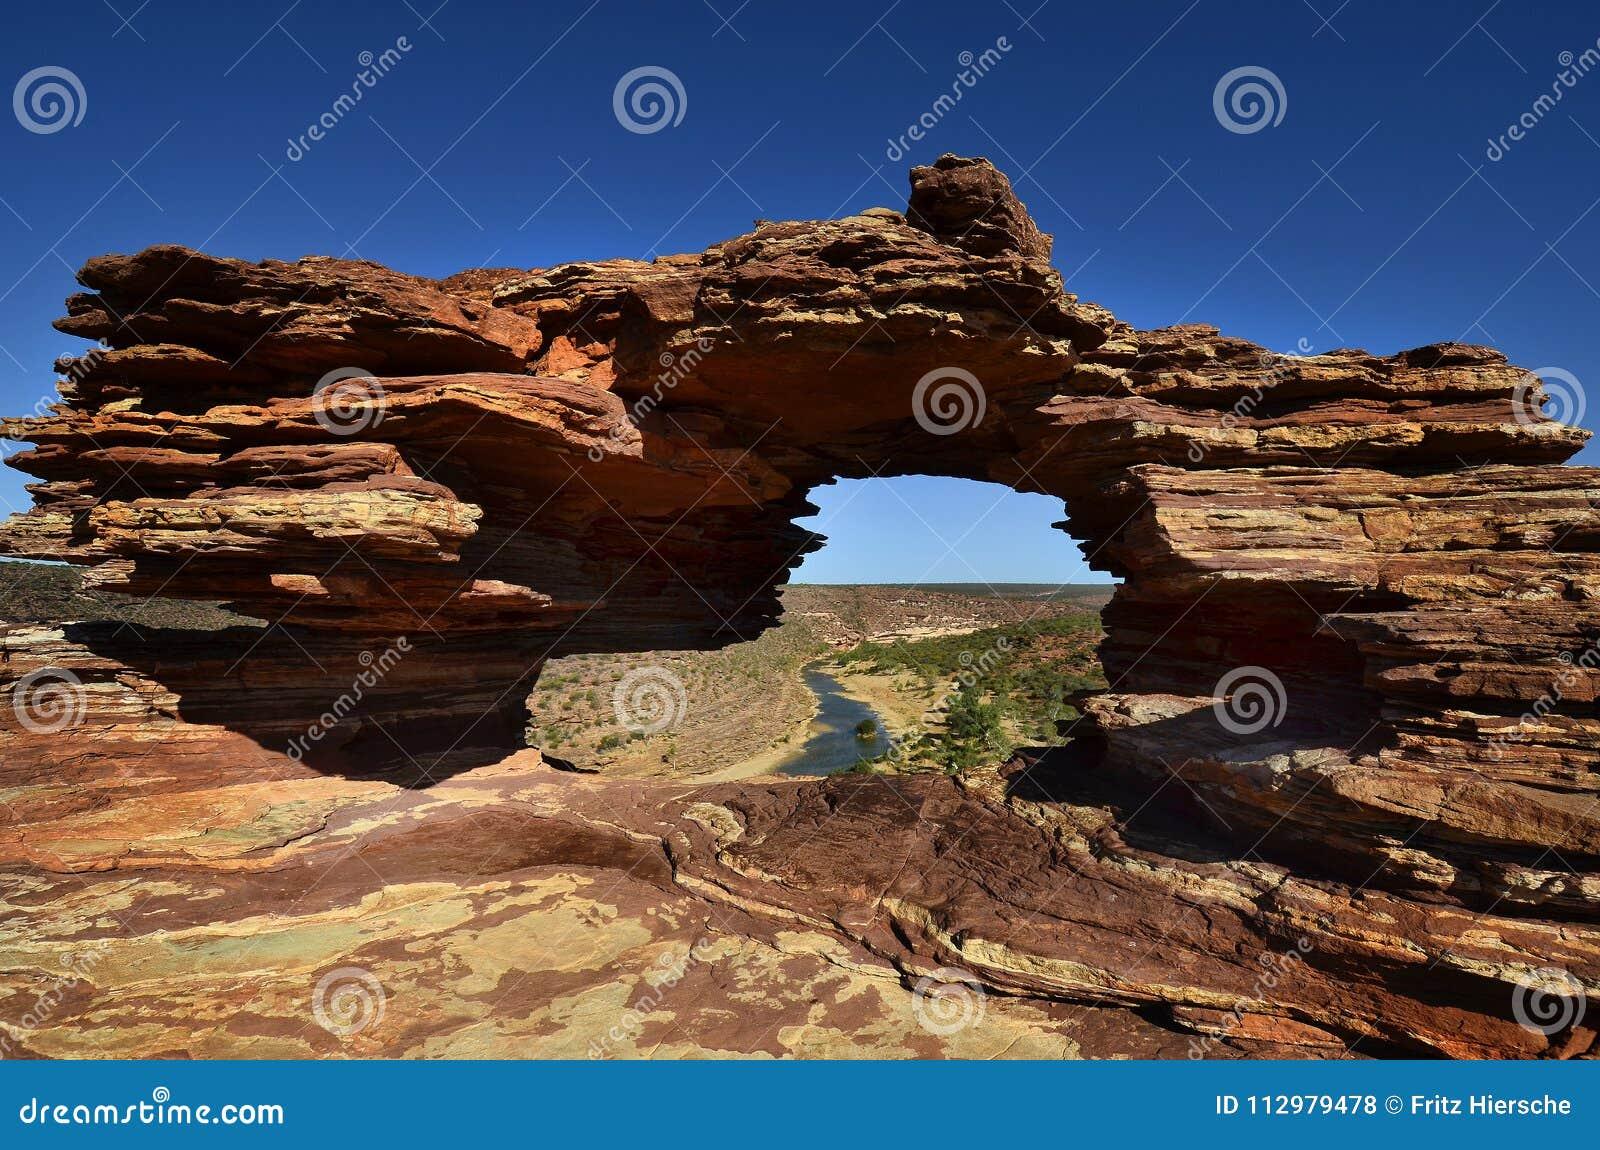 Australia, WA, Kalbarri NP, Natures window